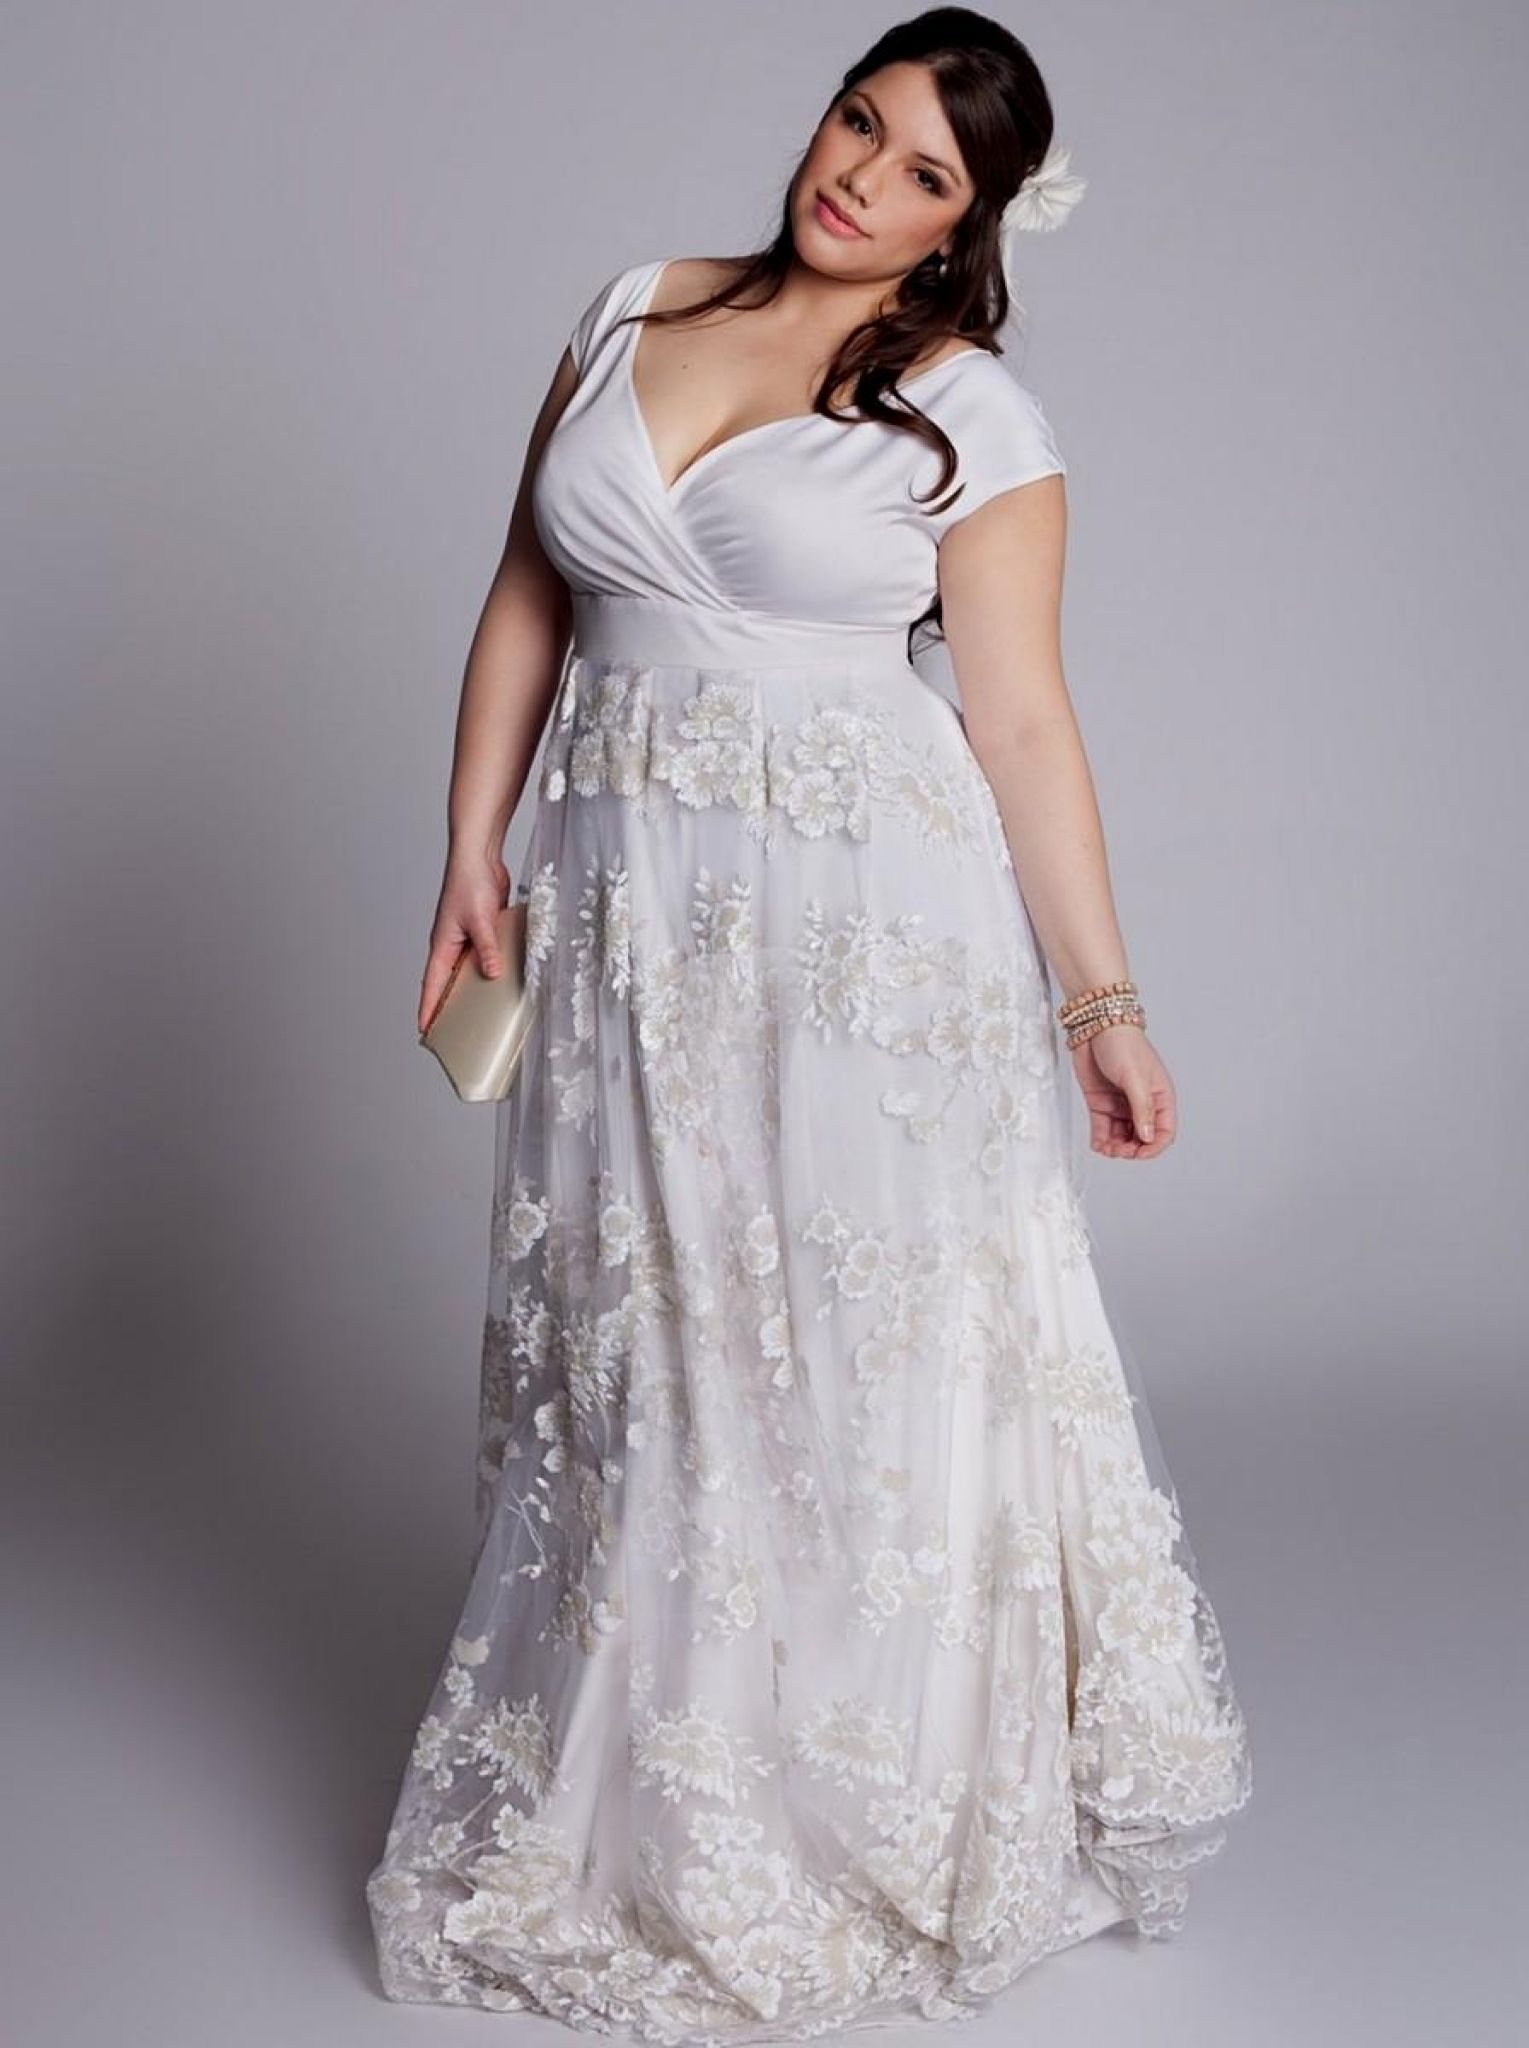 simple wedding dresses for plus size  informal wedding dresses for